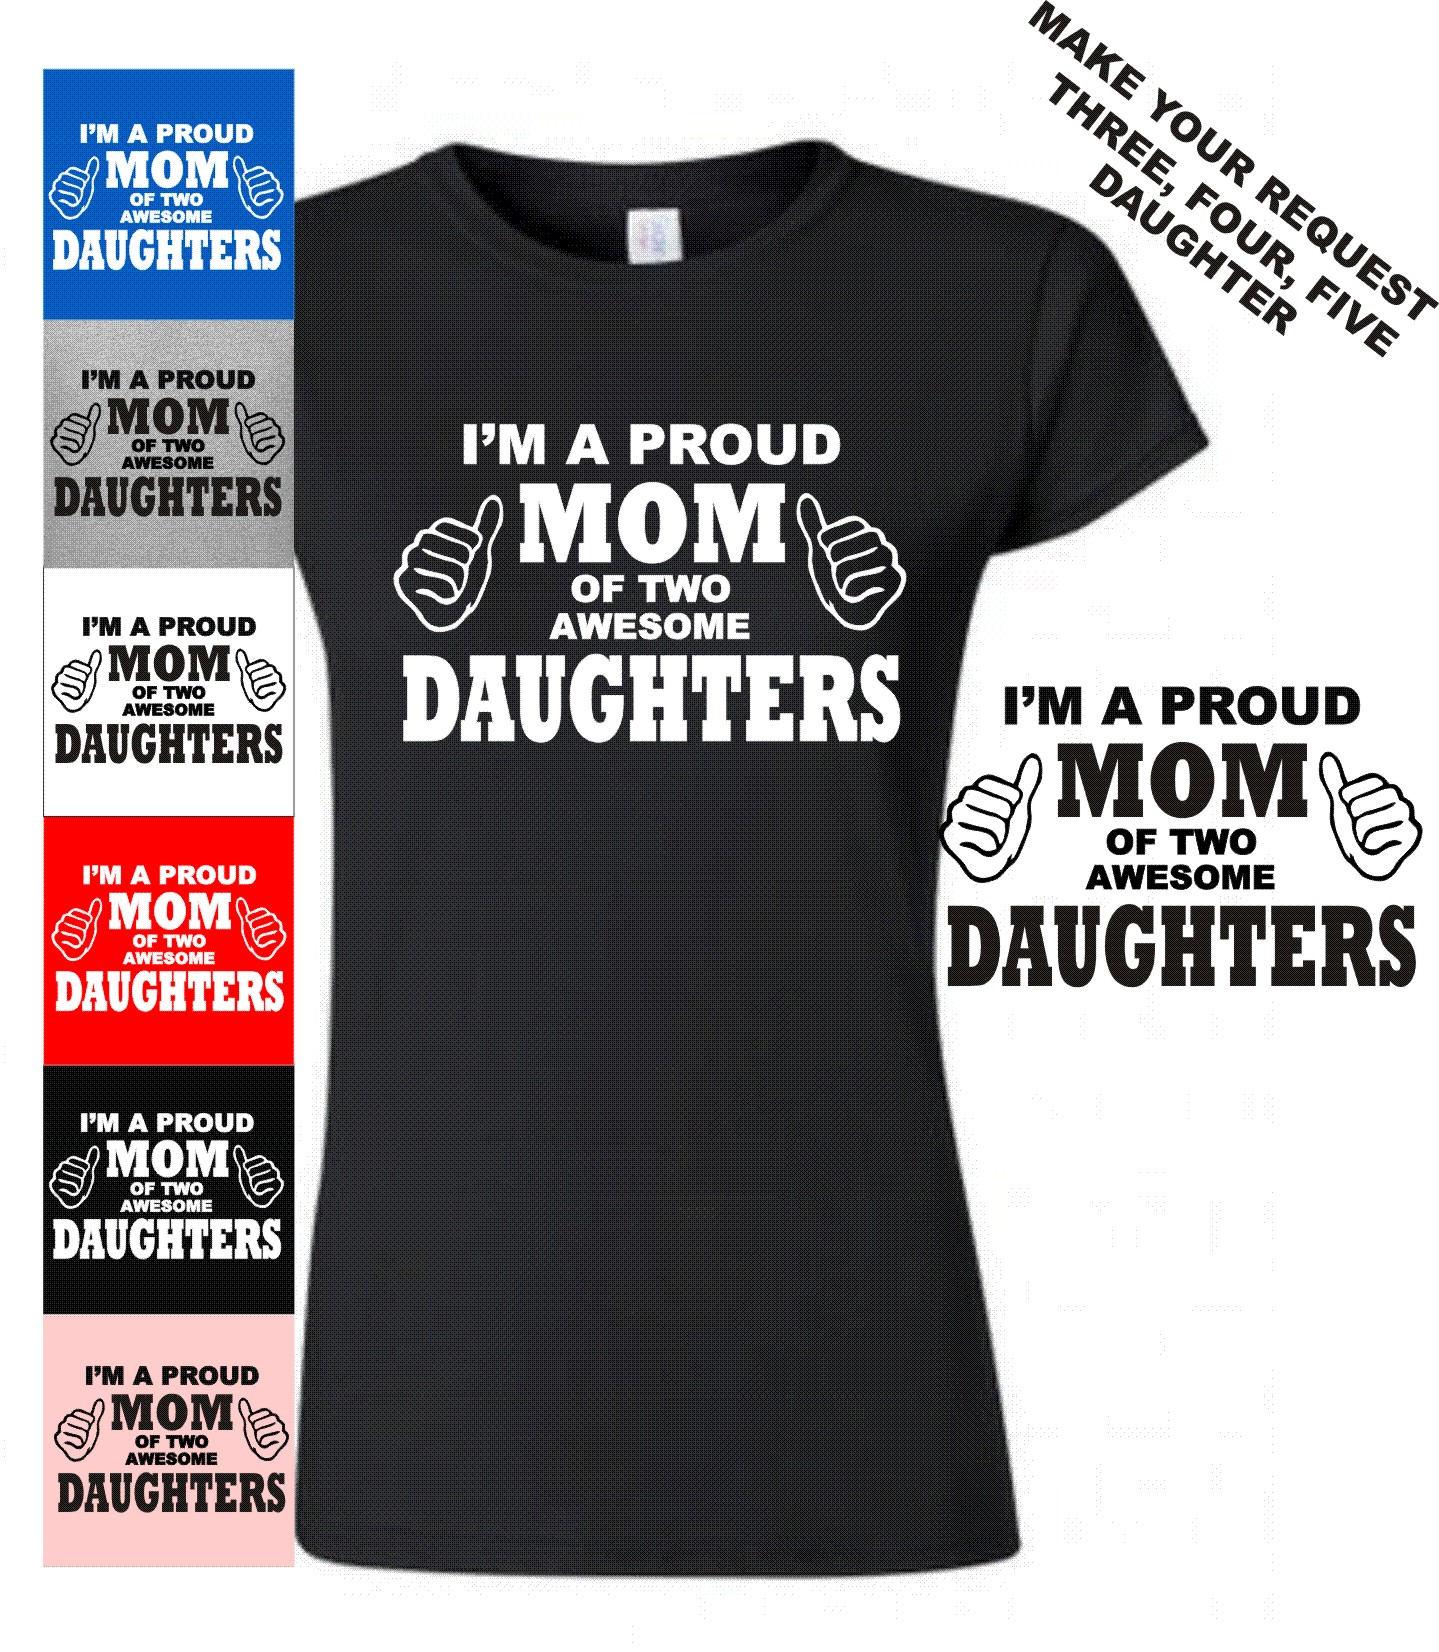 942de5eba Mom Daughter T-Shirt Proud Mom Shirt Mother Daughter Tee | Etsy